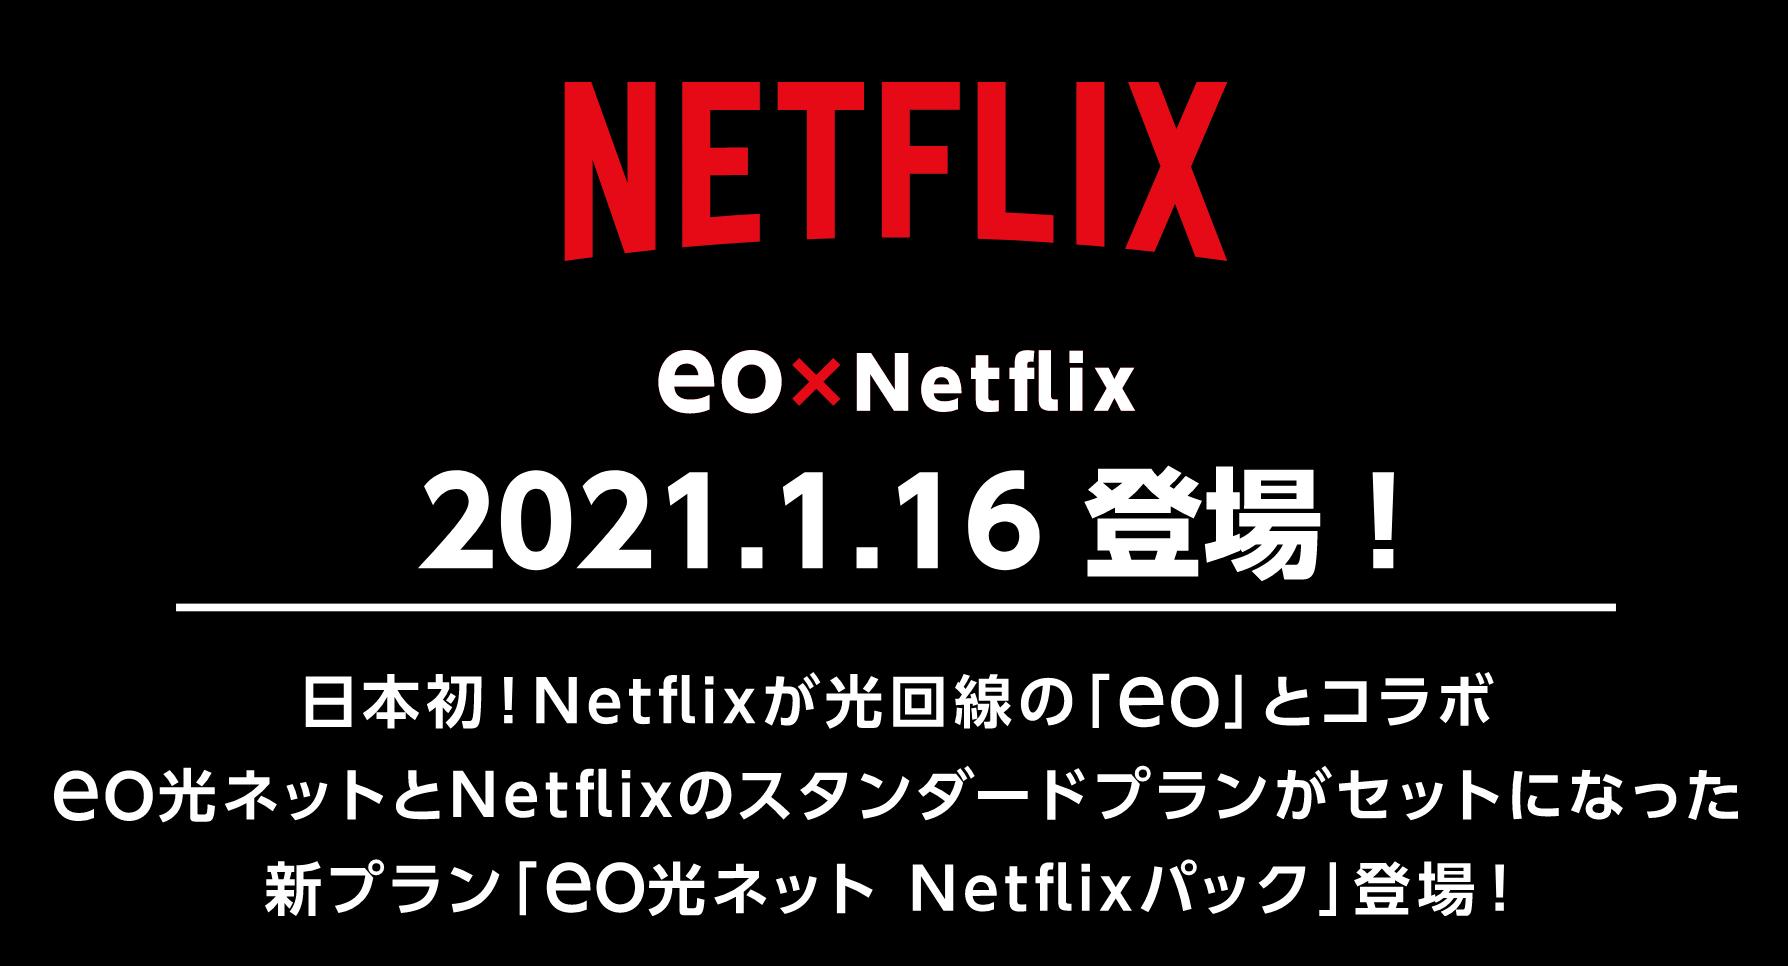 eo光 Netflix